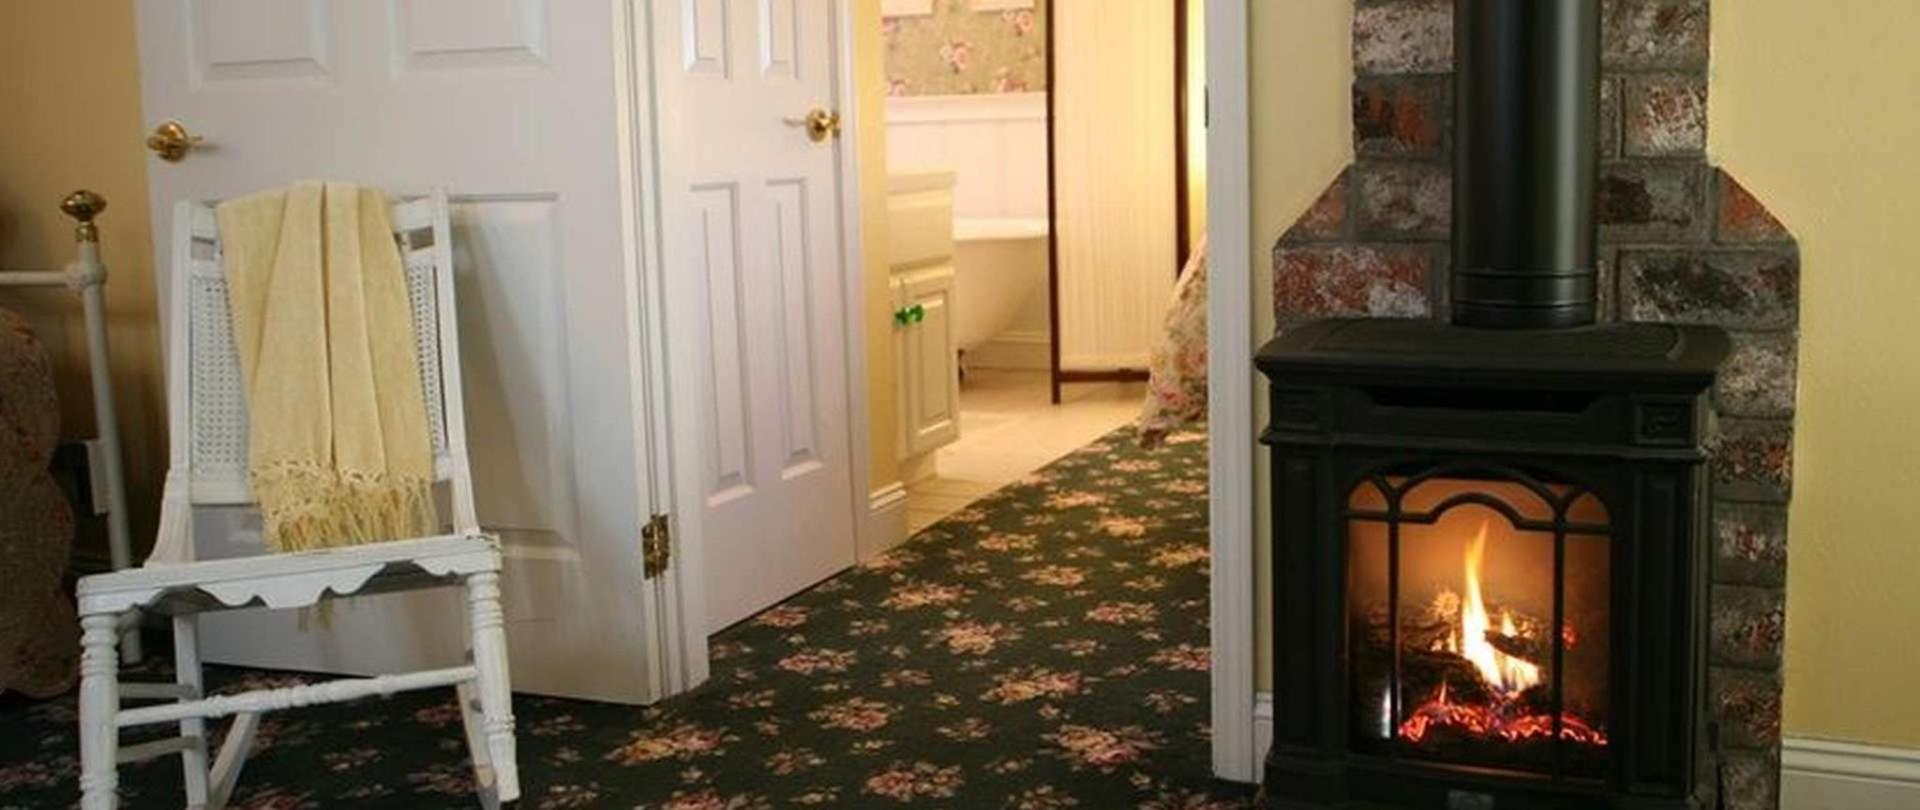 cottage-08060.jpg.1920x810_91_475_23070.jpeg.1920x0.jpeg